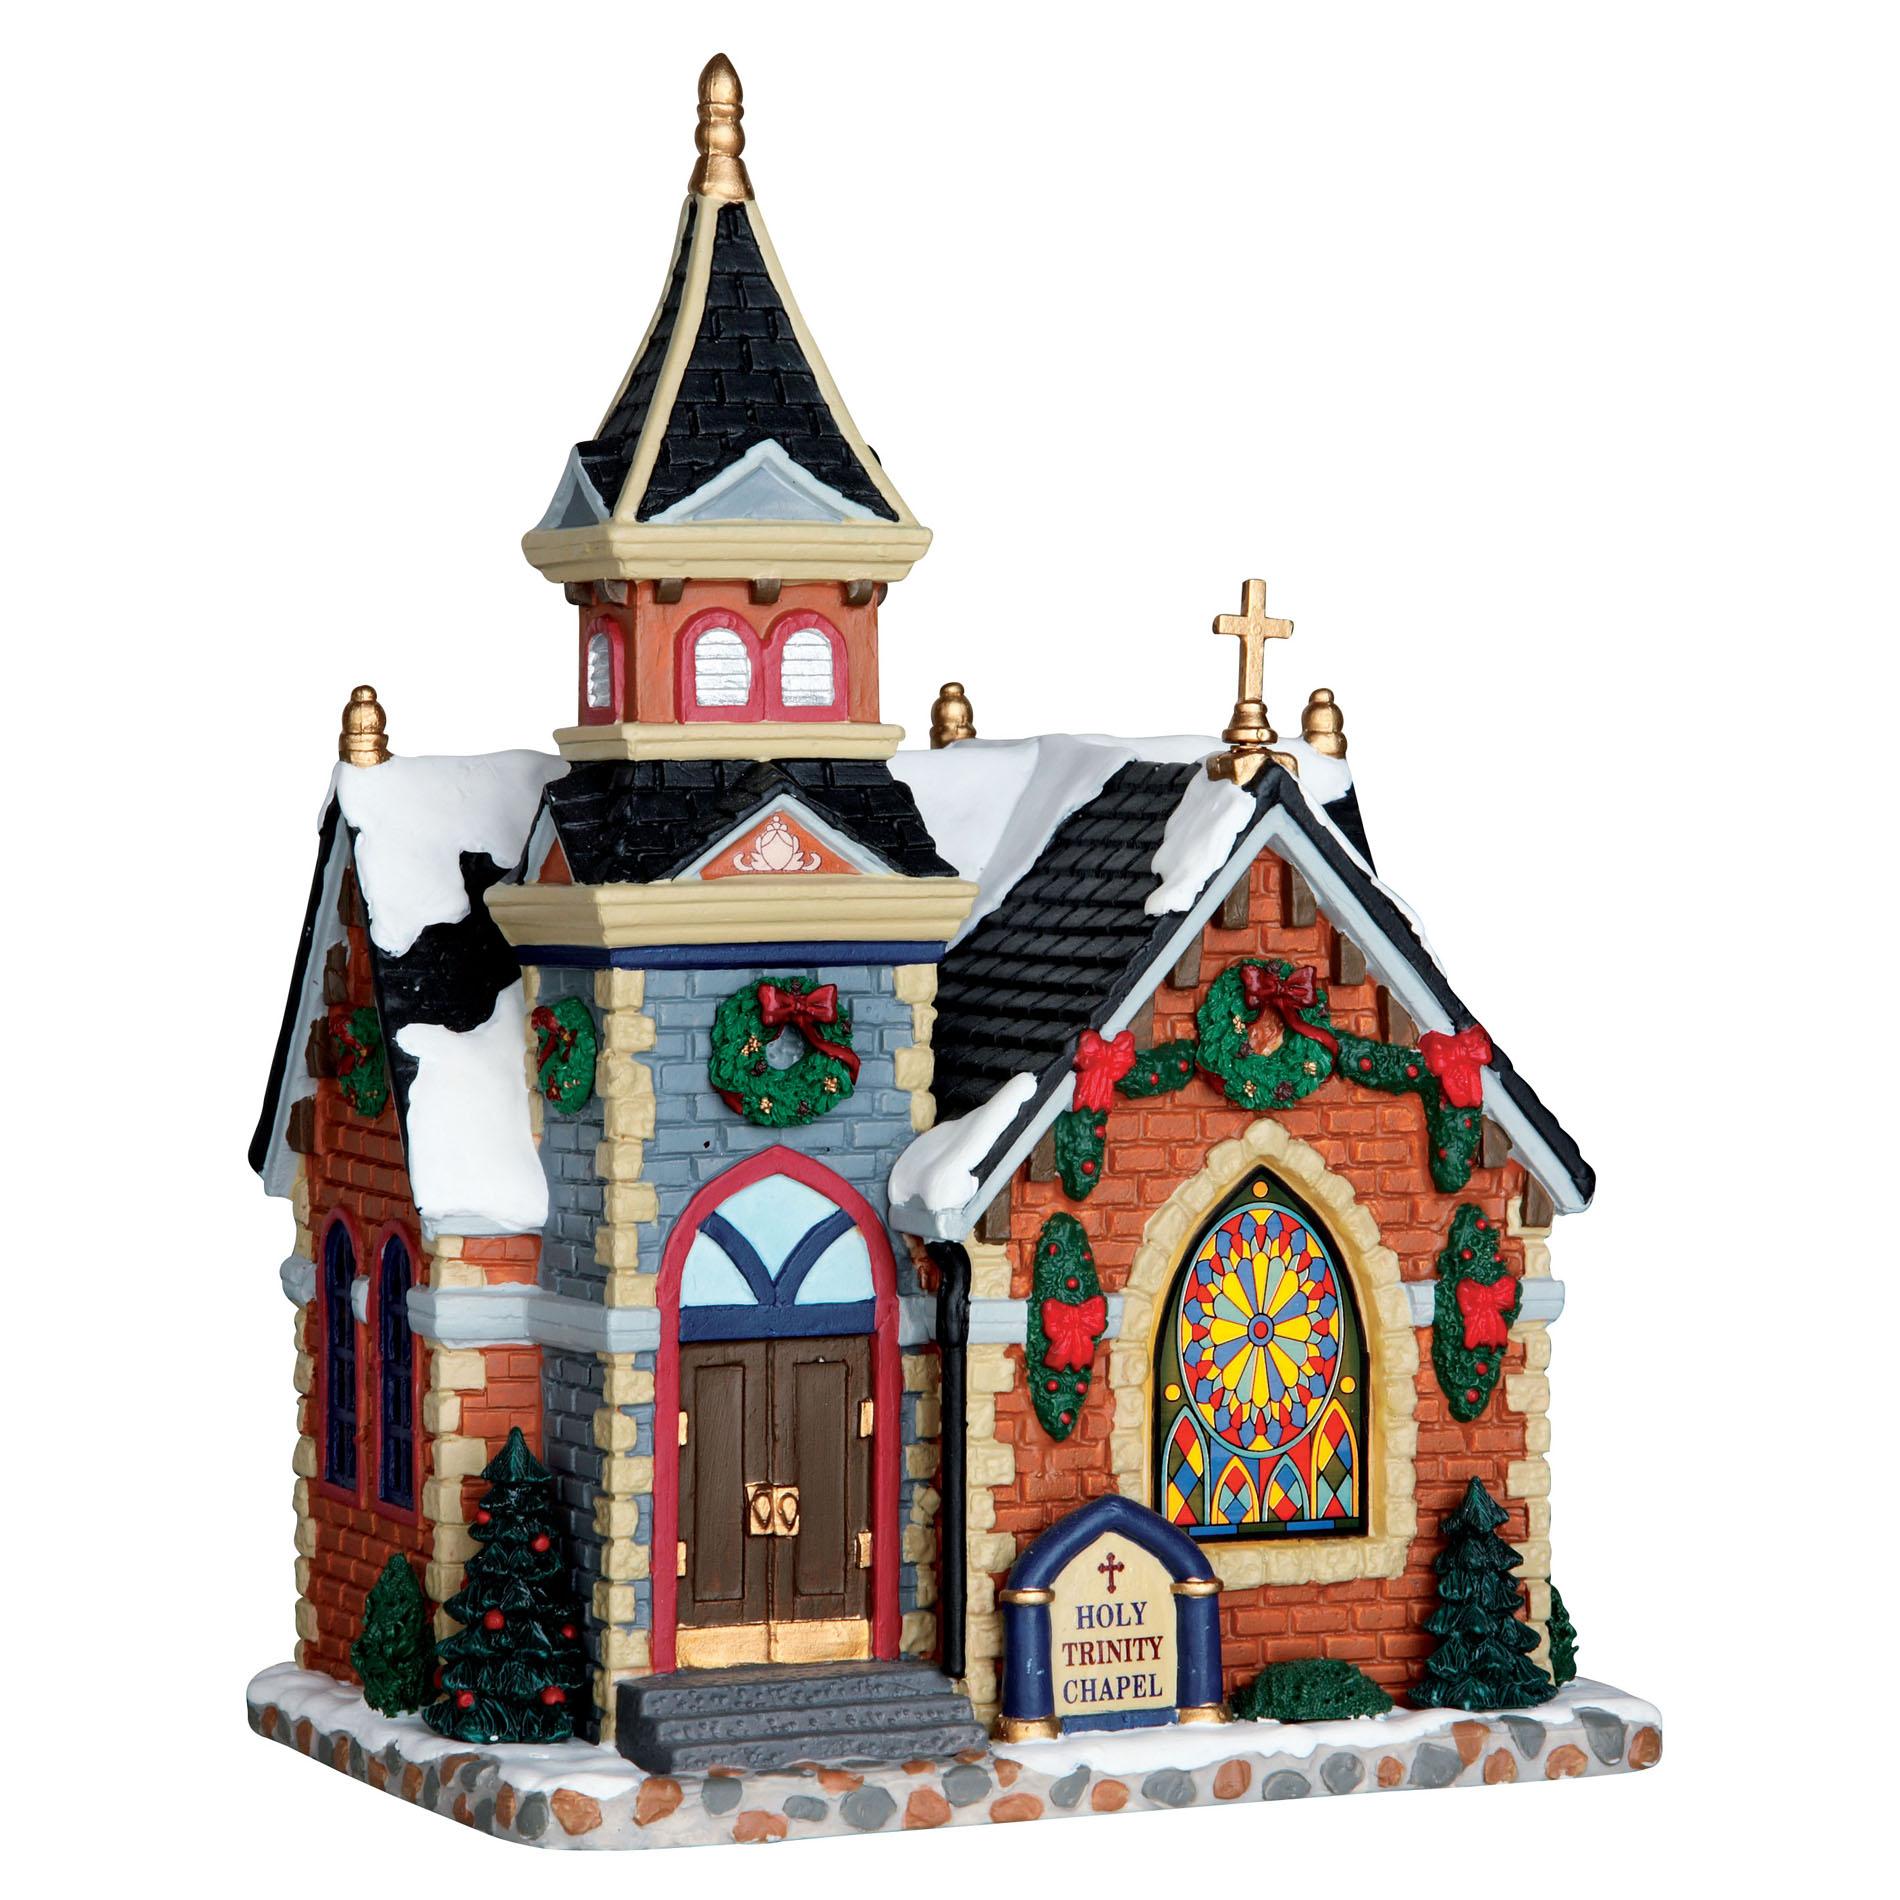 LIC LIMITED Christmas Village Building Holy Trinity Chapel